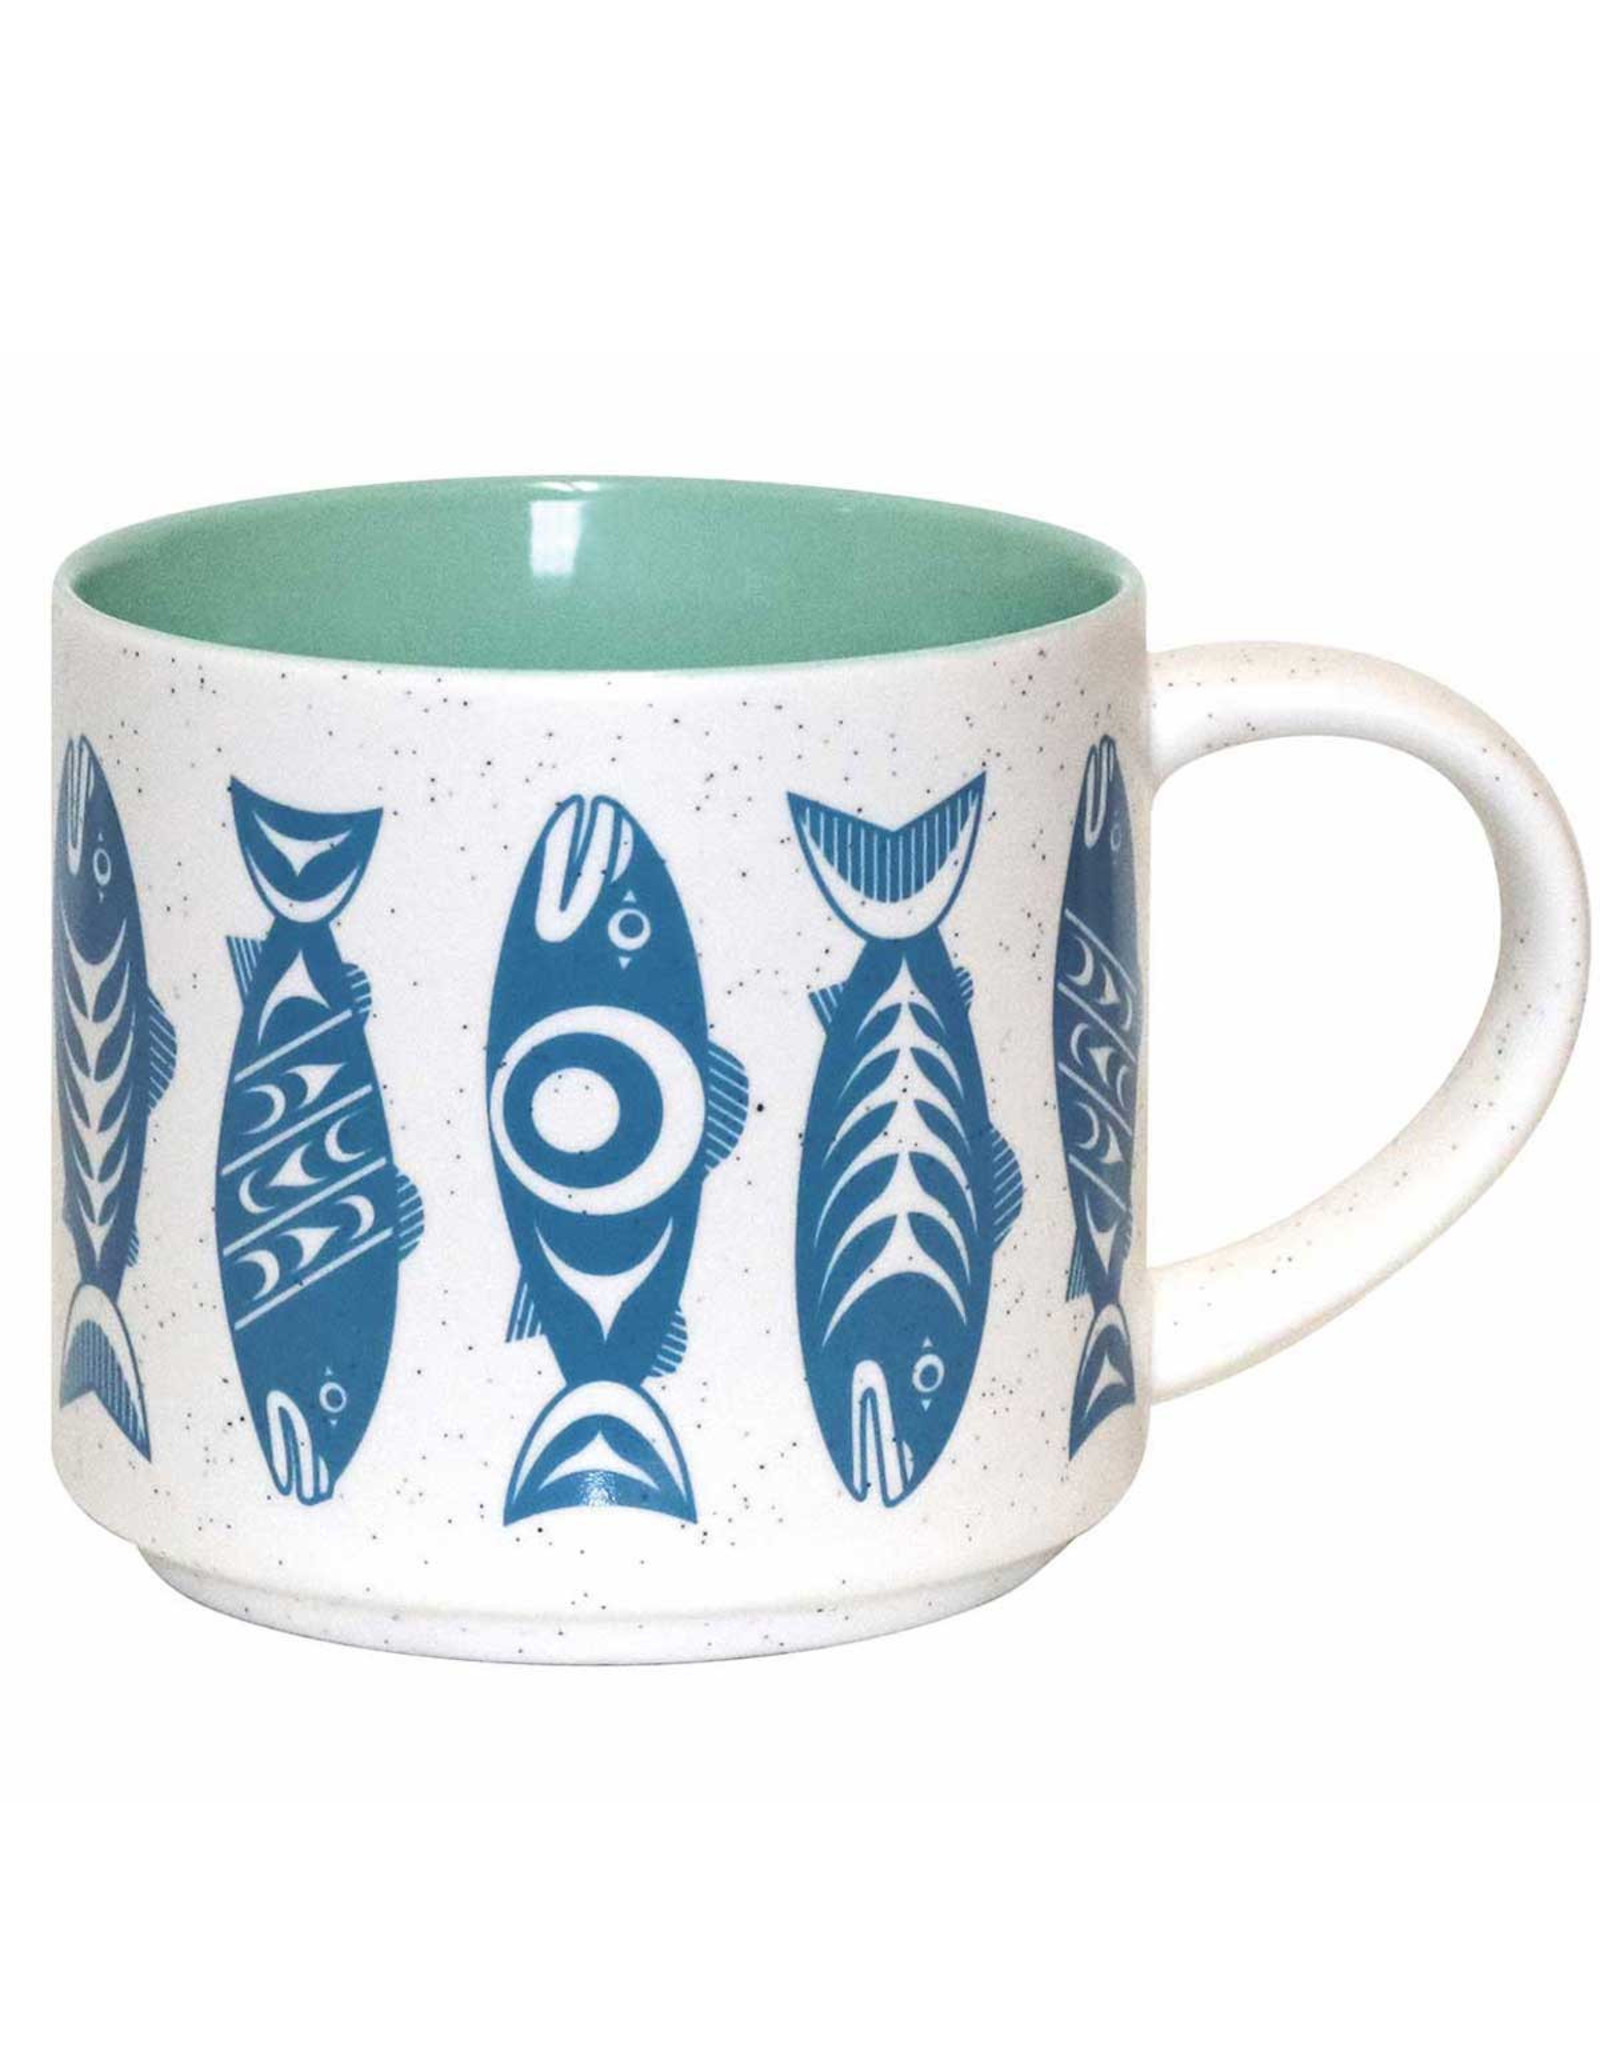 Ceramic Mug - Salmon in the Wild (CMUG18)